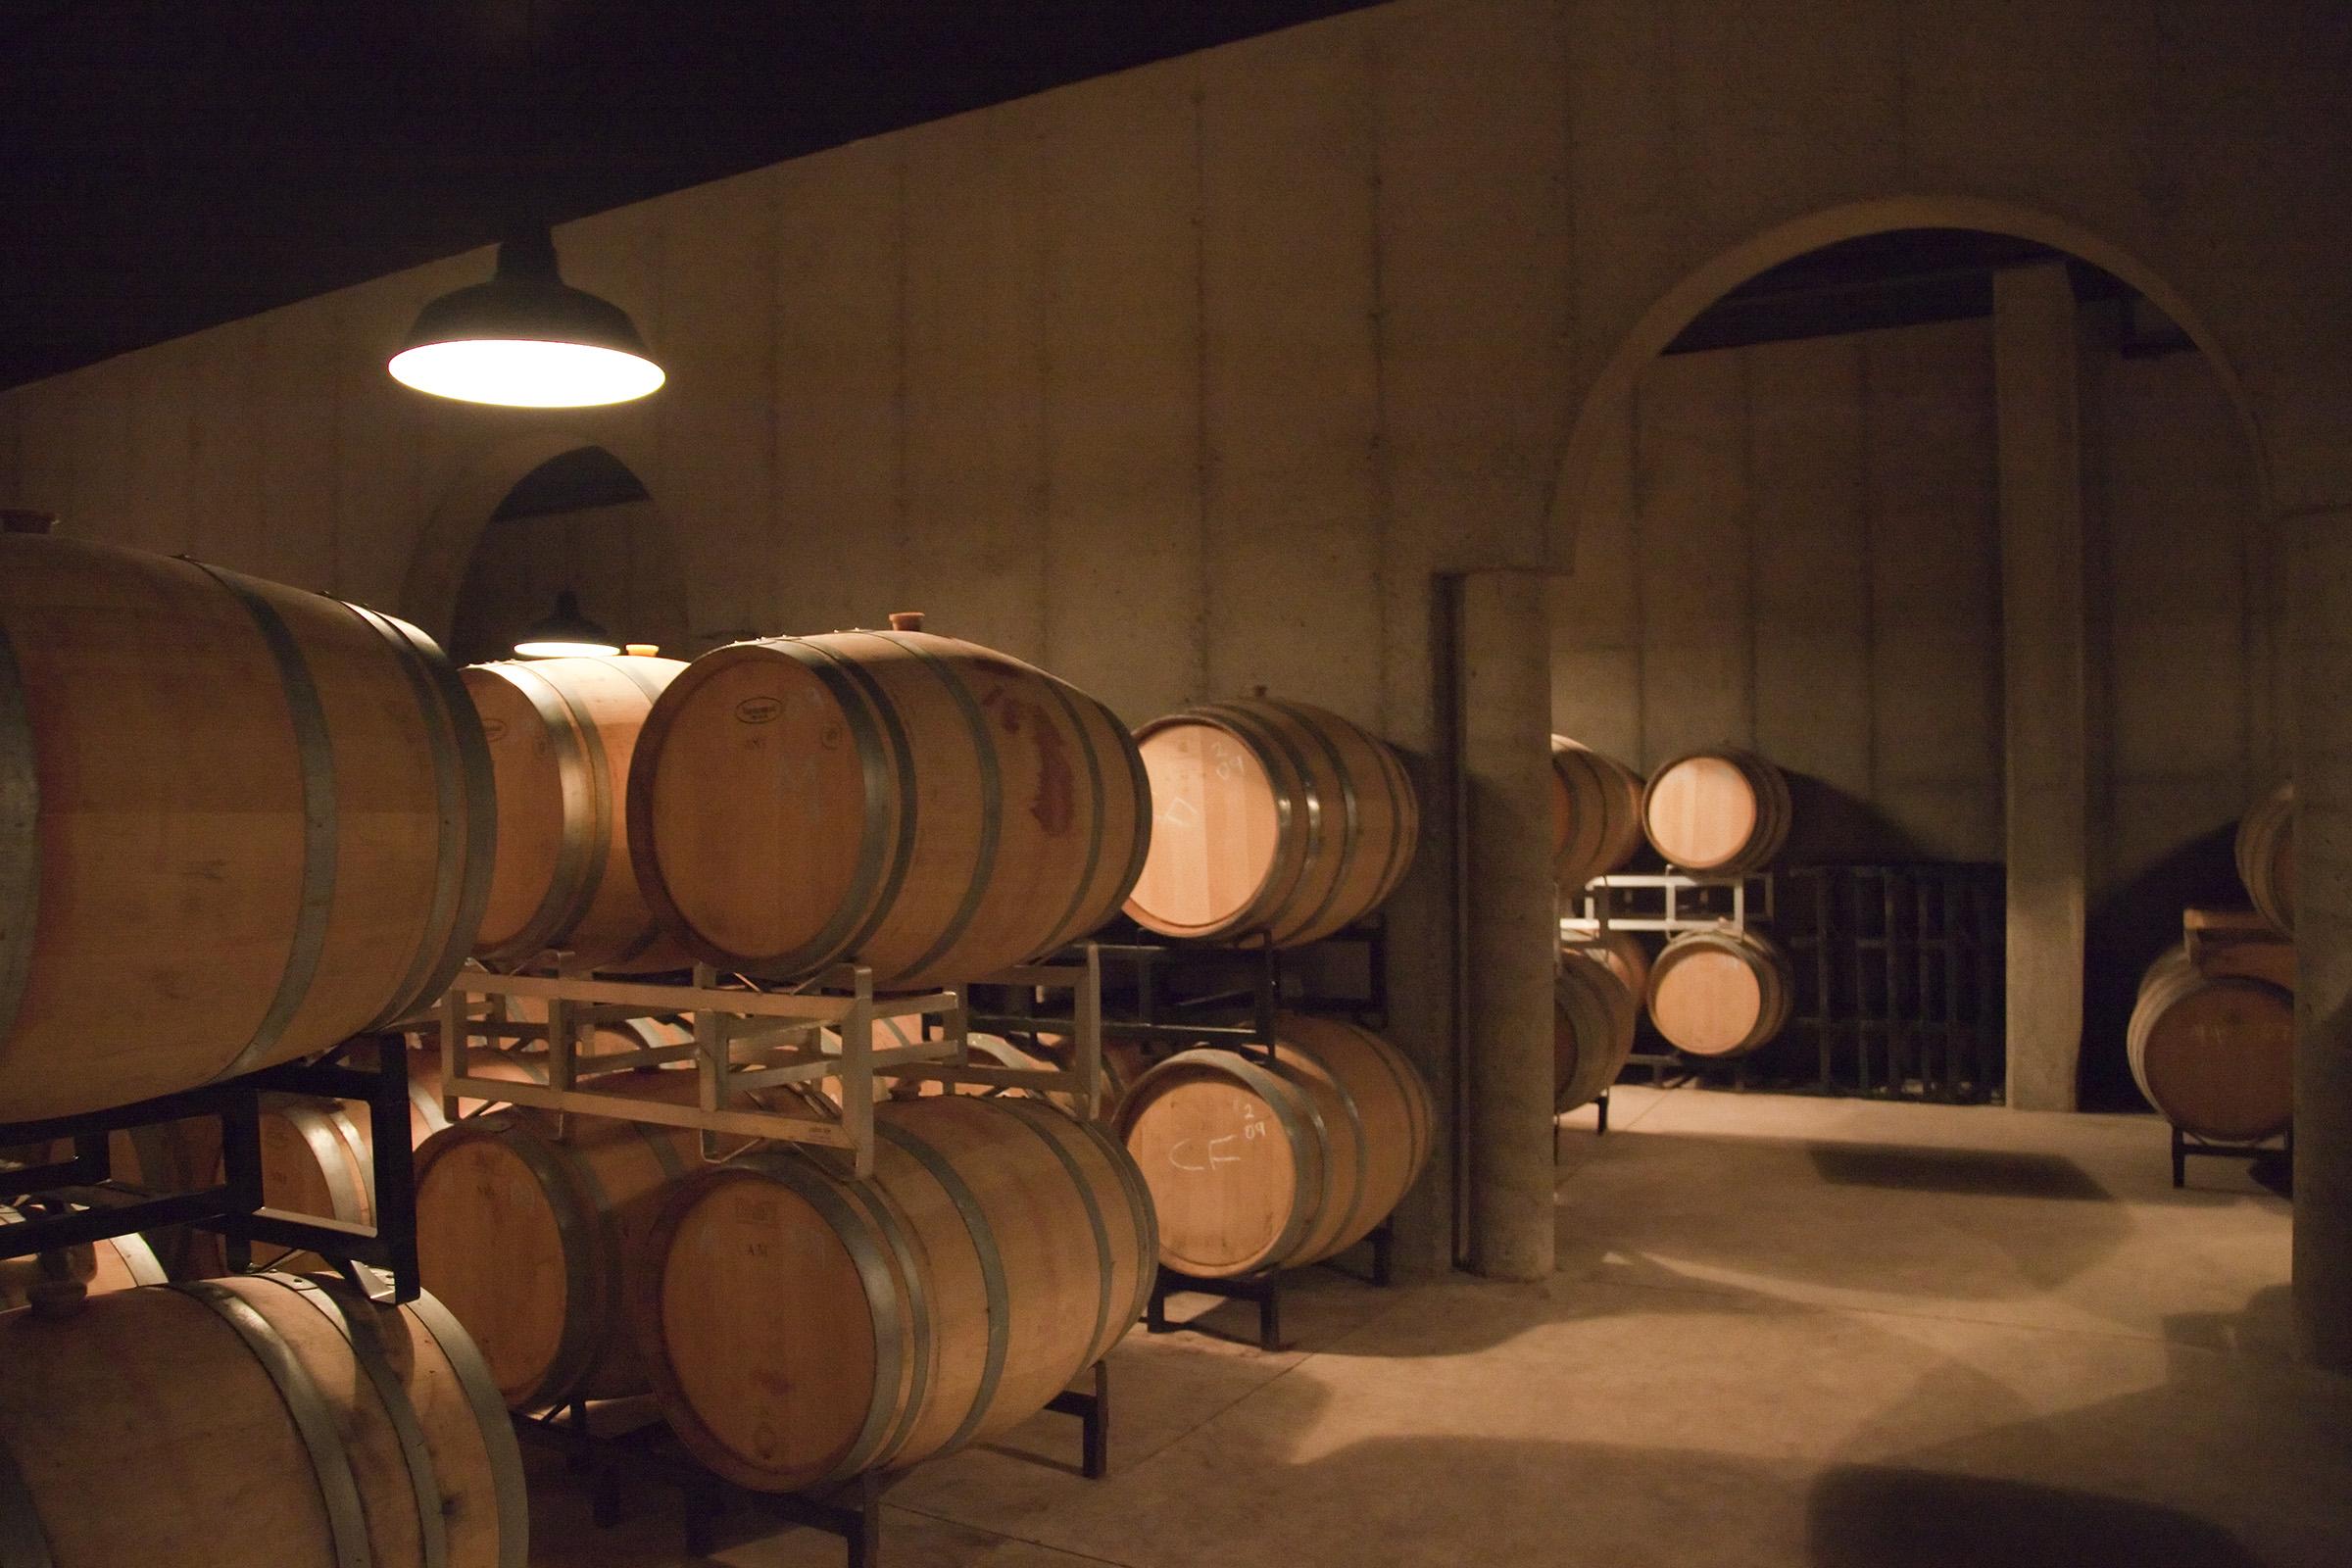 Wine barrels, Age, Resistant, Keg, Liquid, HQ Photo